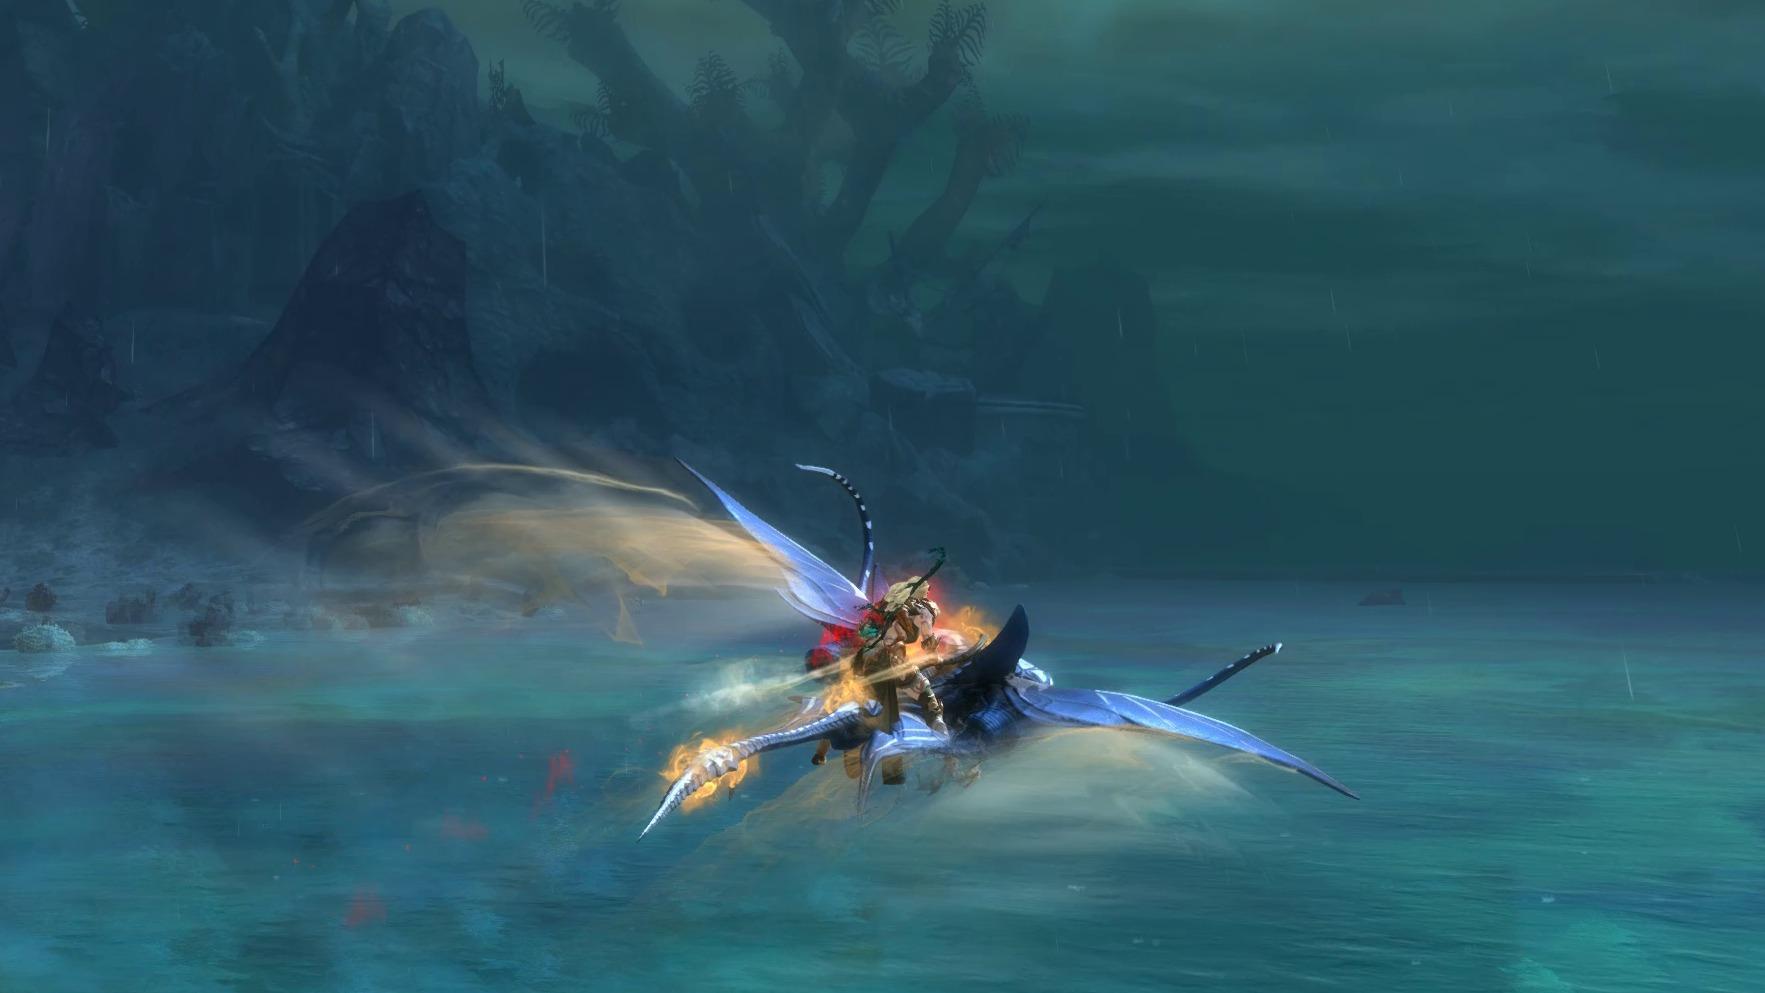 A Skimmer, skimming